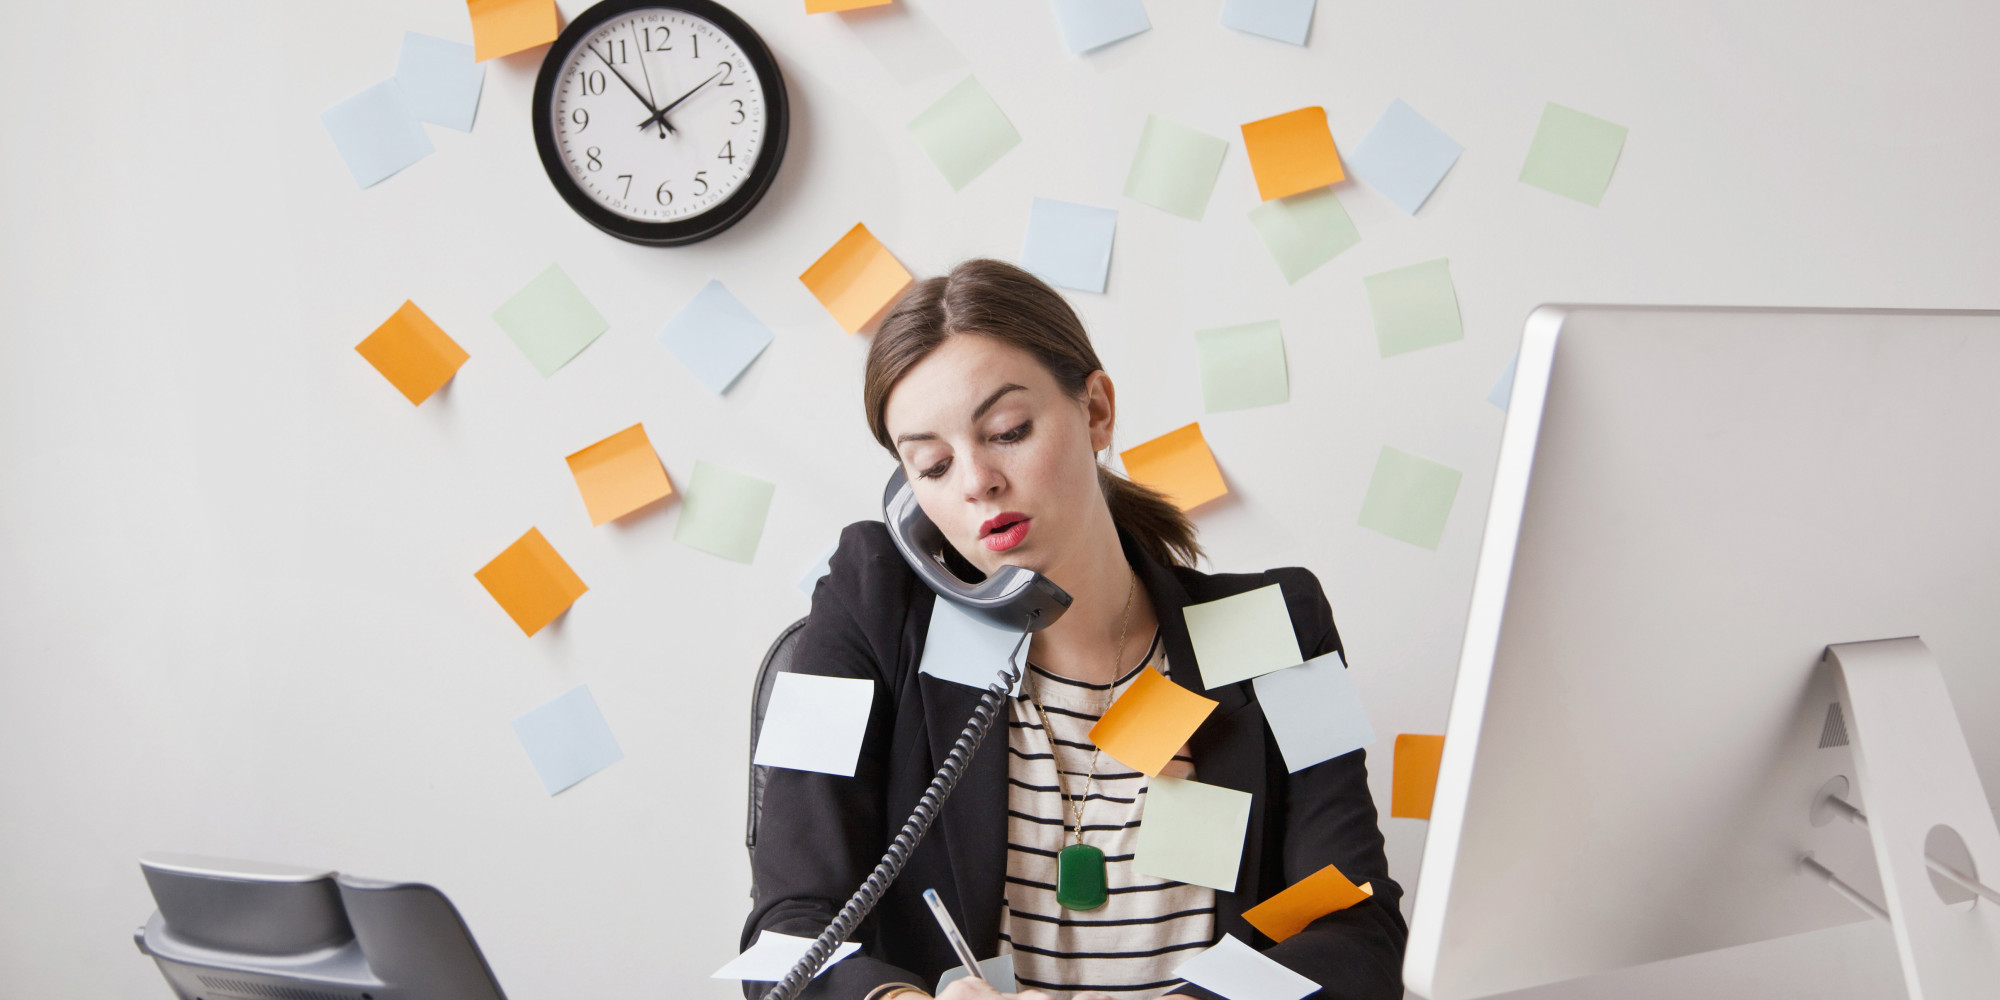 Multitasking: The Multitasking Myth